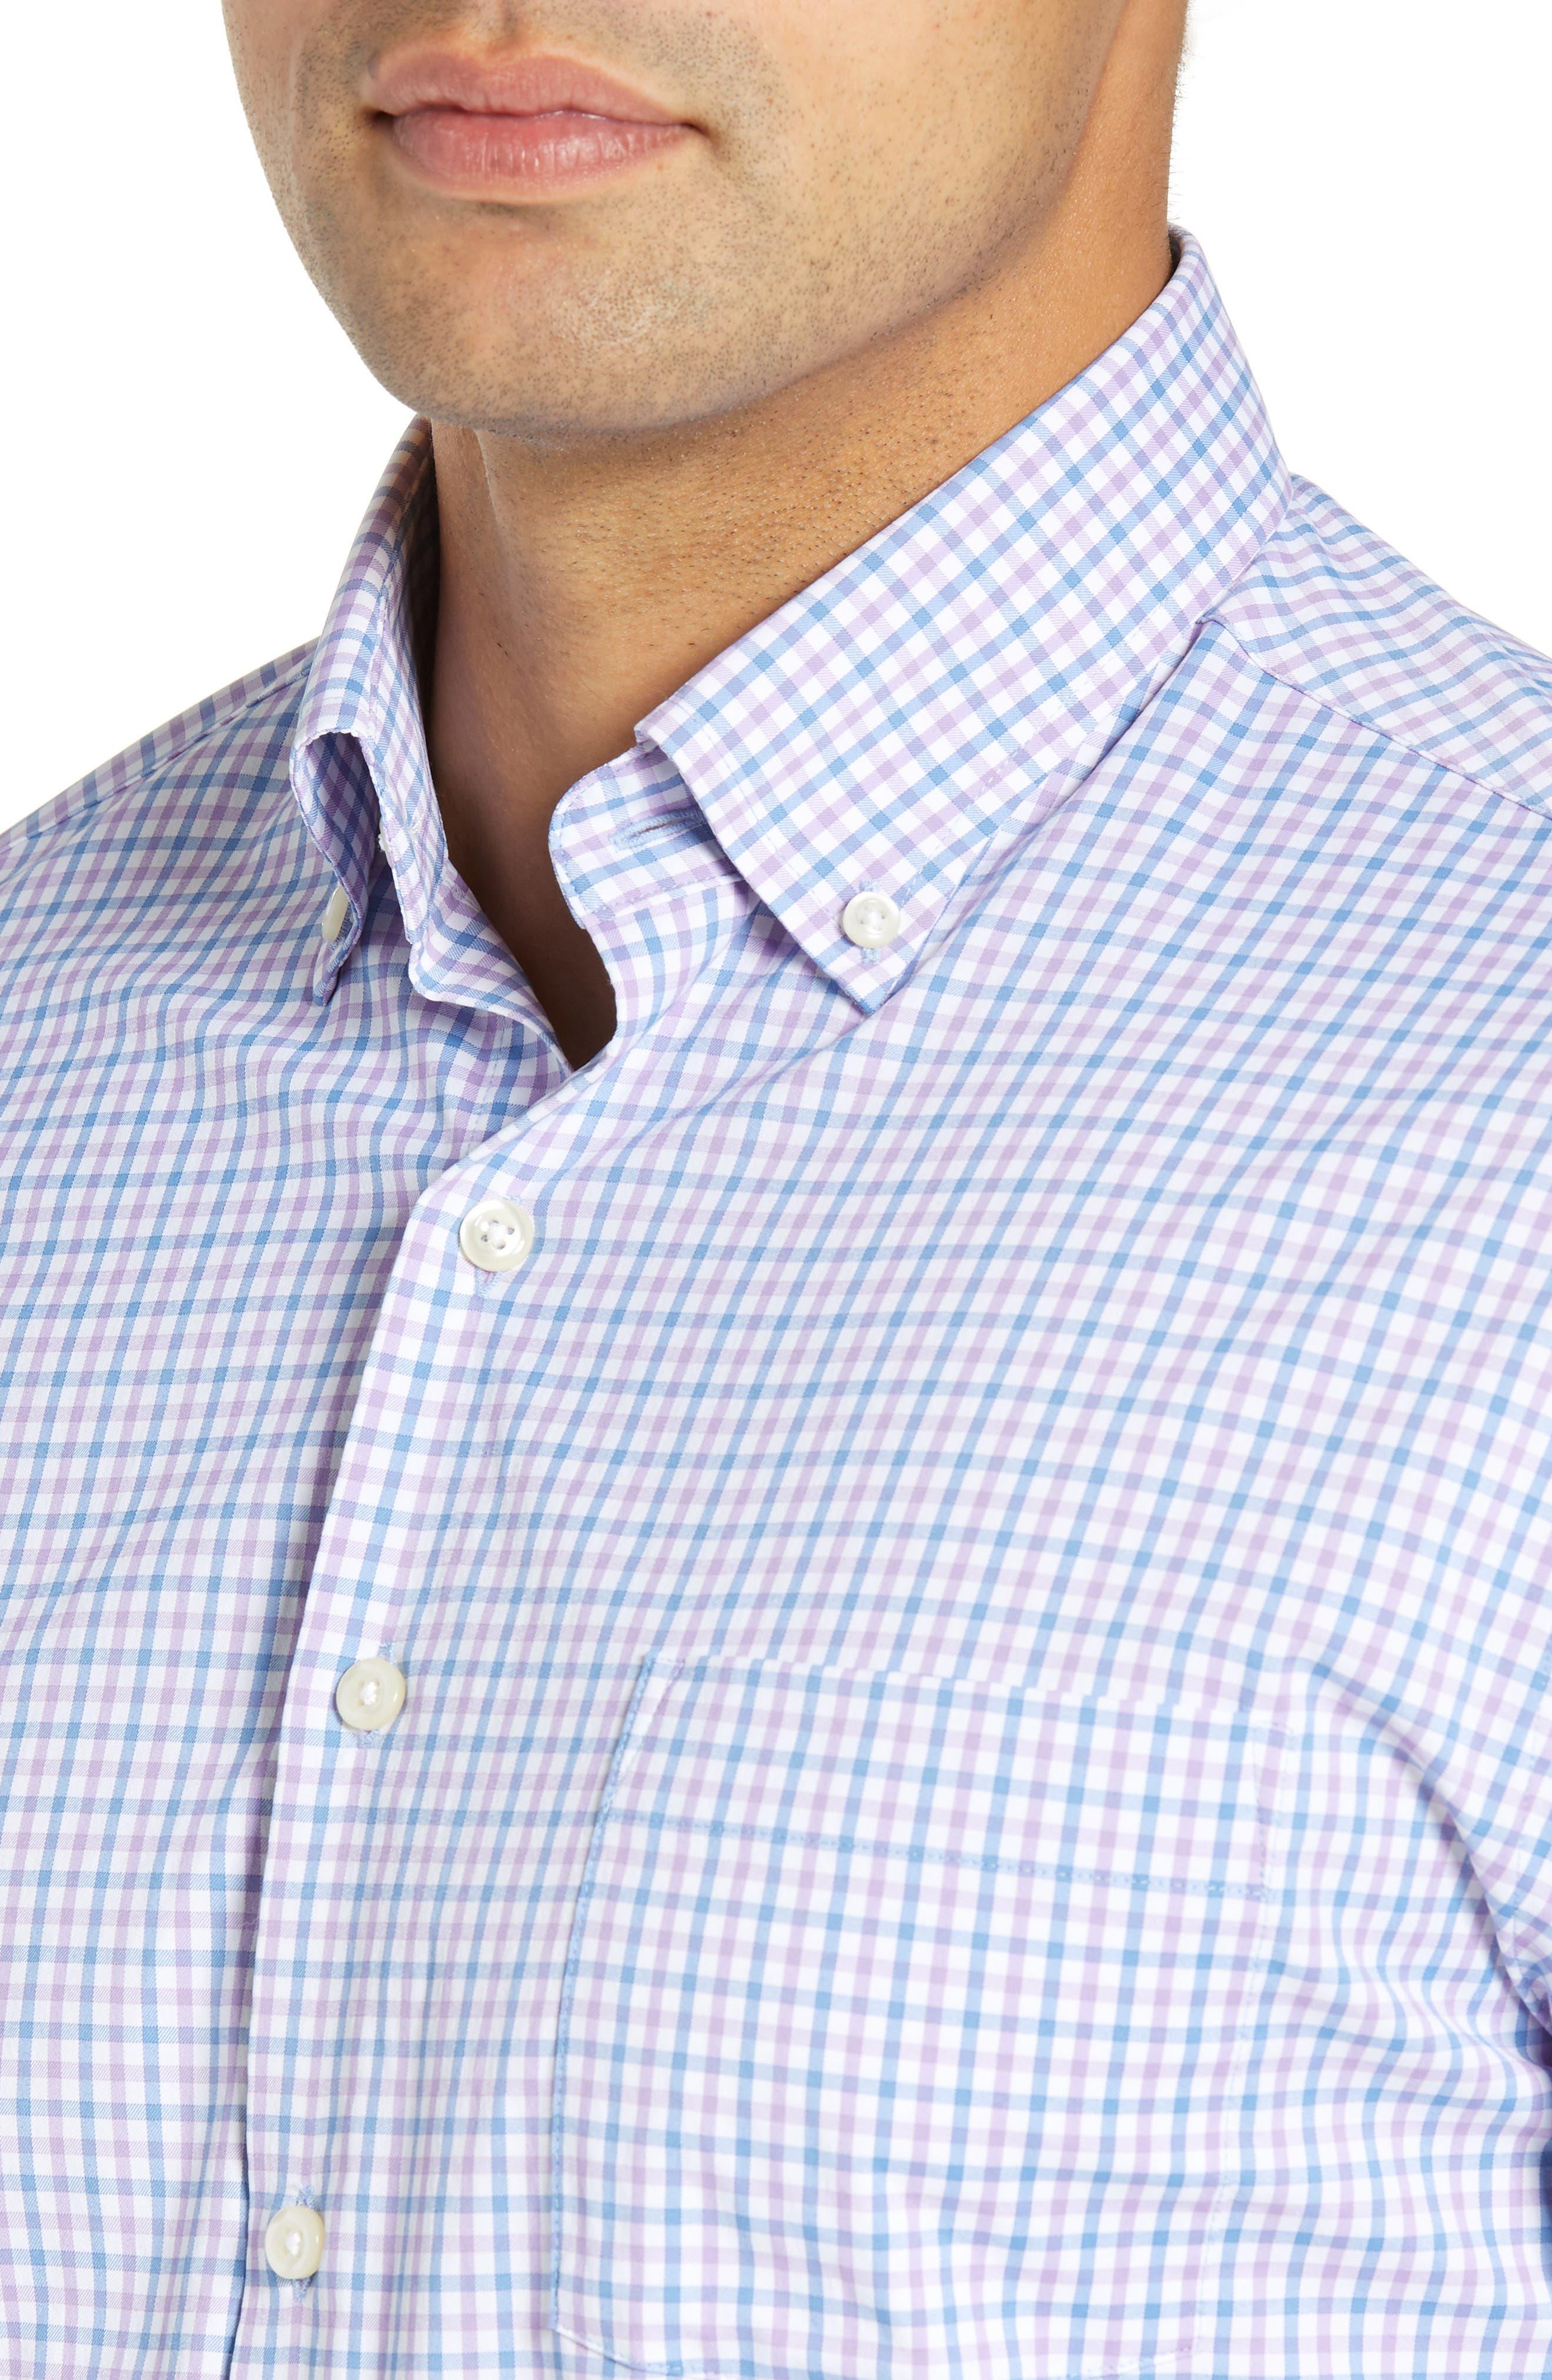 Natural Touch Regular Fit Performance Sport Shirt,                             Alternate thumbnail 2, color,                             VESSEL/ BRITISH GREY